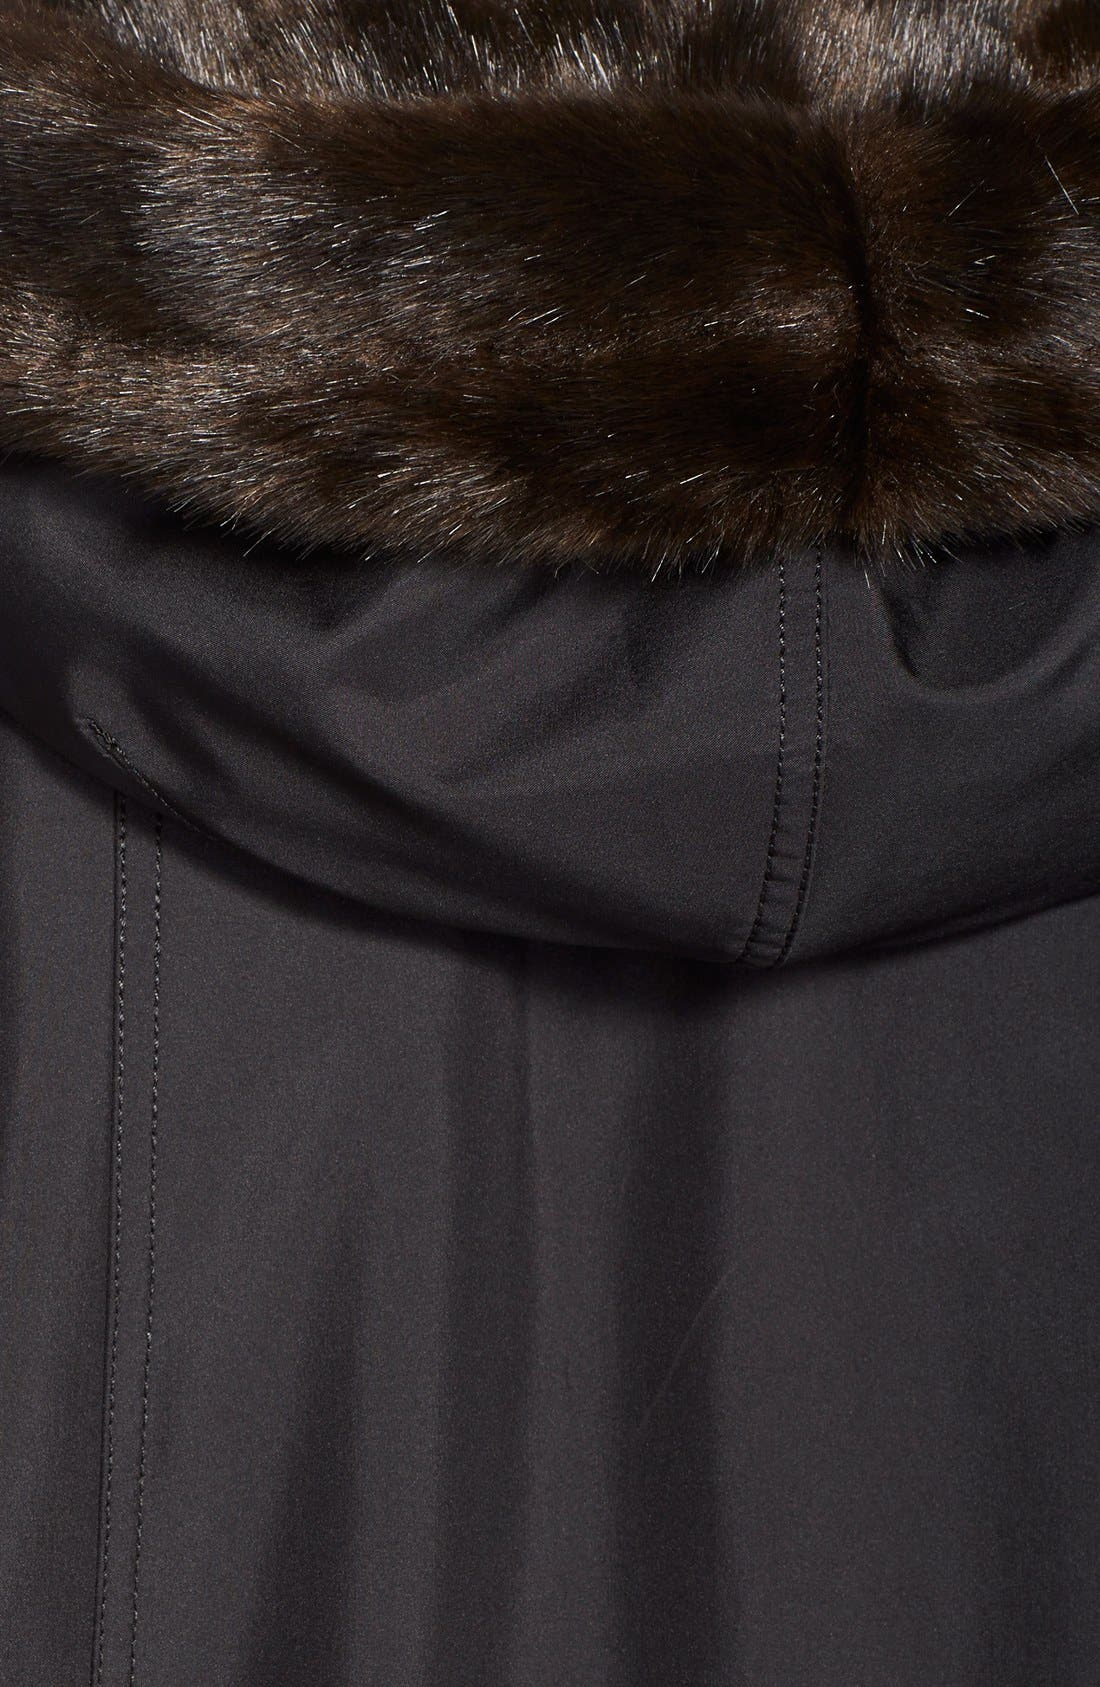 A-Line Storm Coat with FauxFur Lining & Trim,                             Alternate thumbnail 2, color,                             001